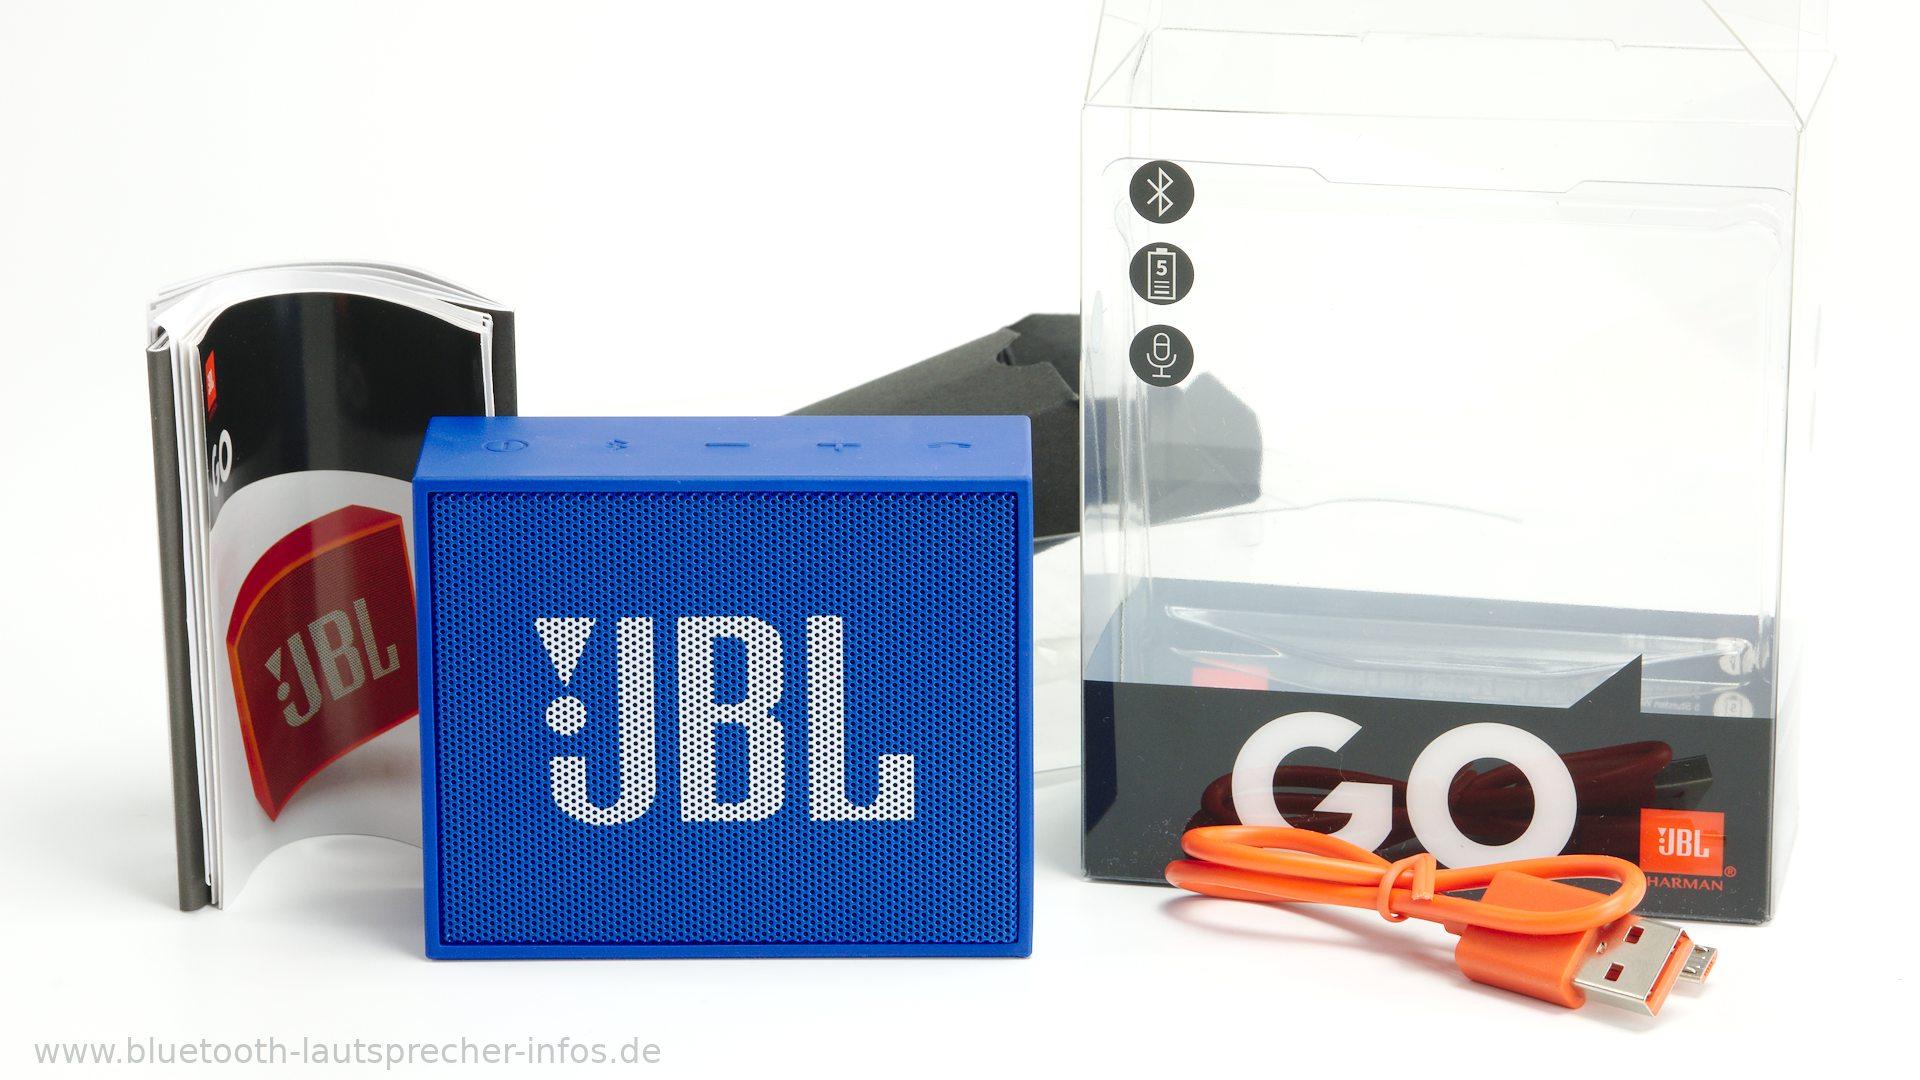 jbl go im test sehr kleiner bluetooth laustprecher. Black Bedroom Furniture Sets. Home Design Ideas